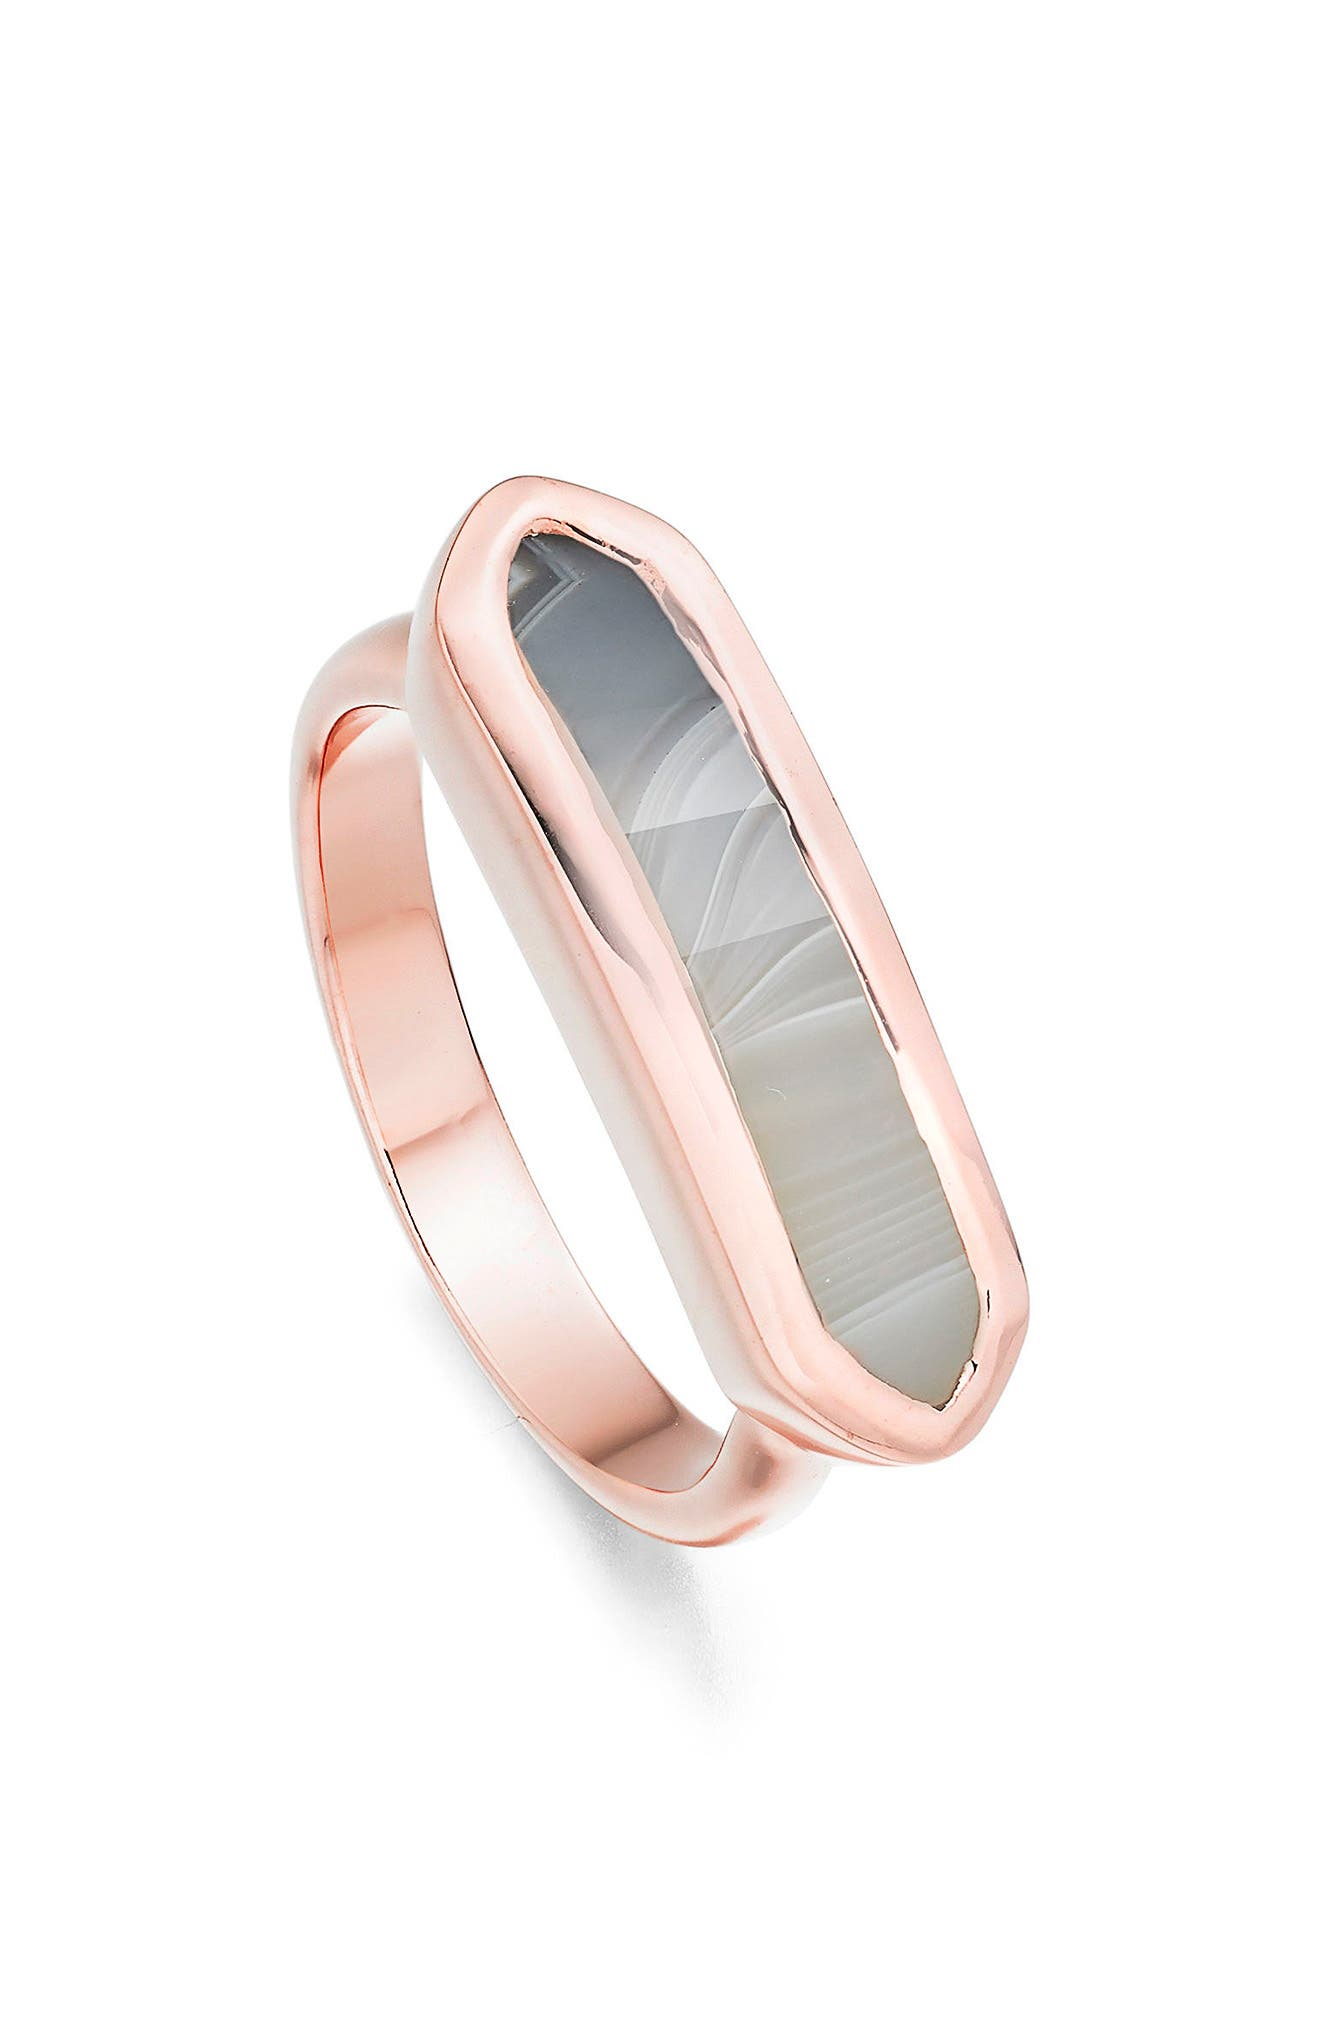 Baja Grey Agate Ring,                             Alternate thumbnail 4, color,                             Rose Gold/ Grey Agate